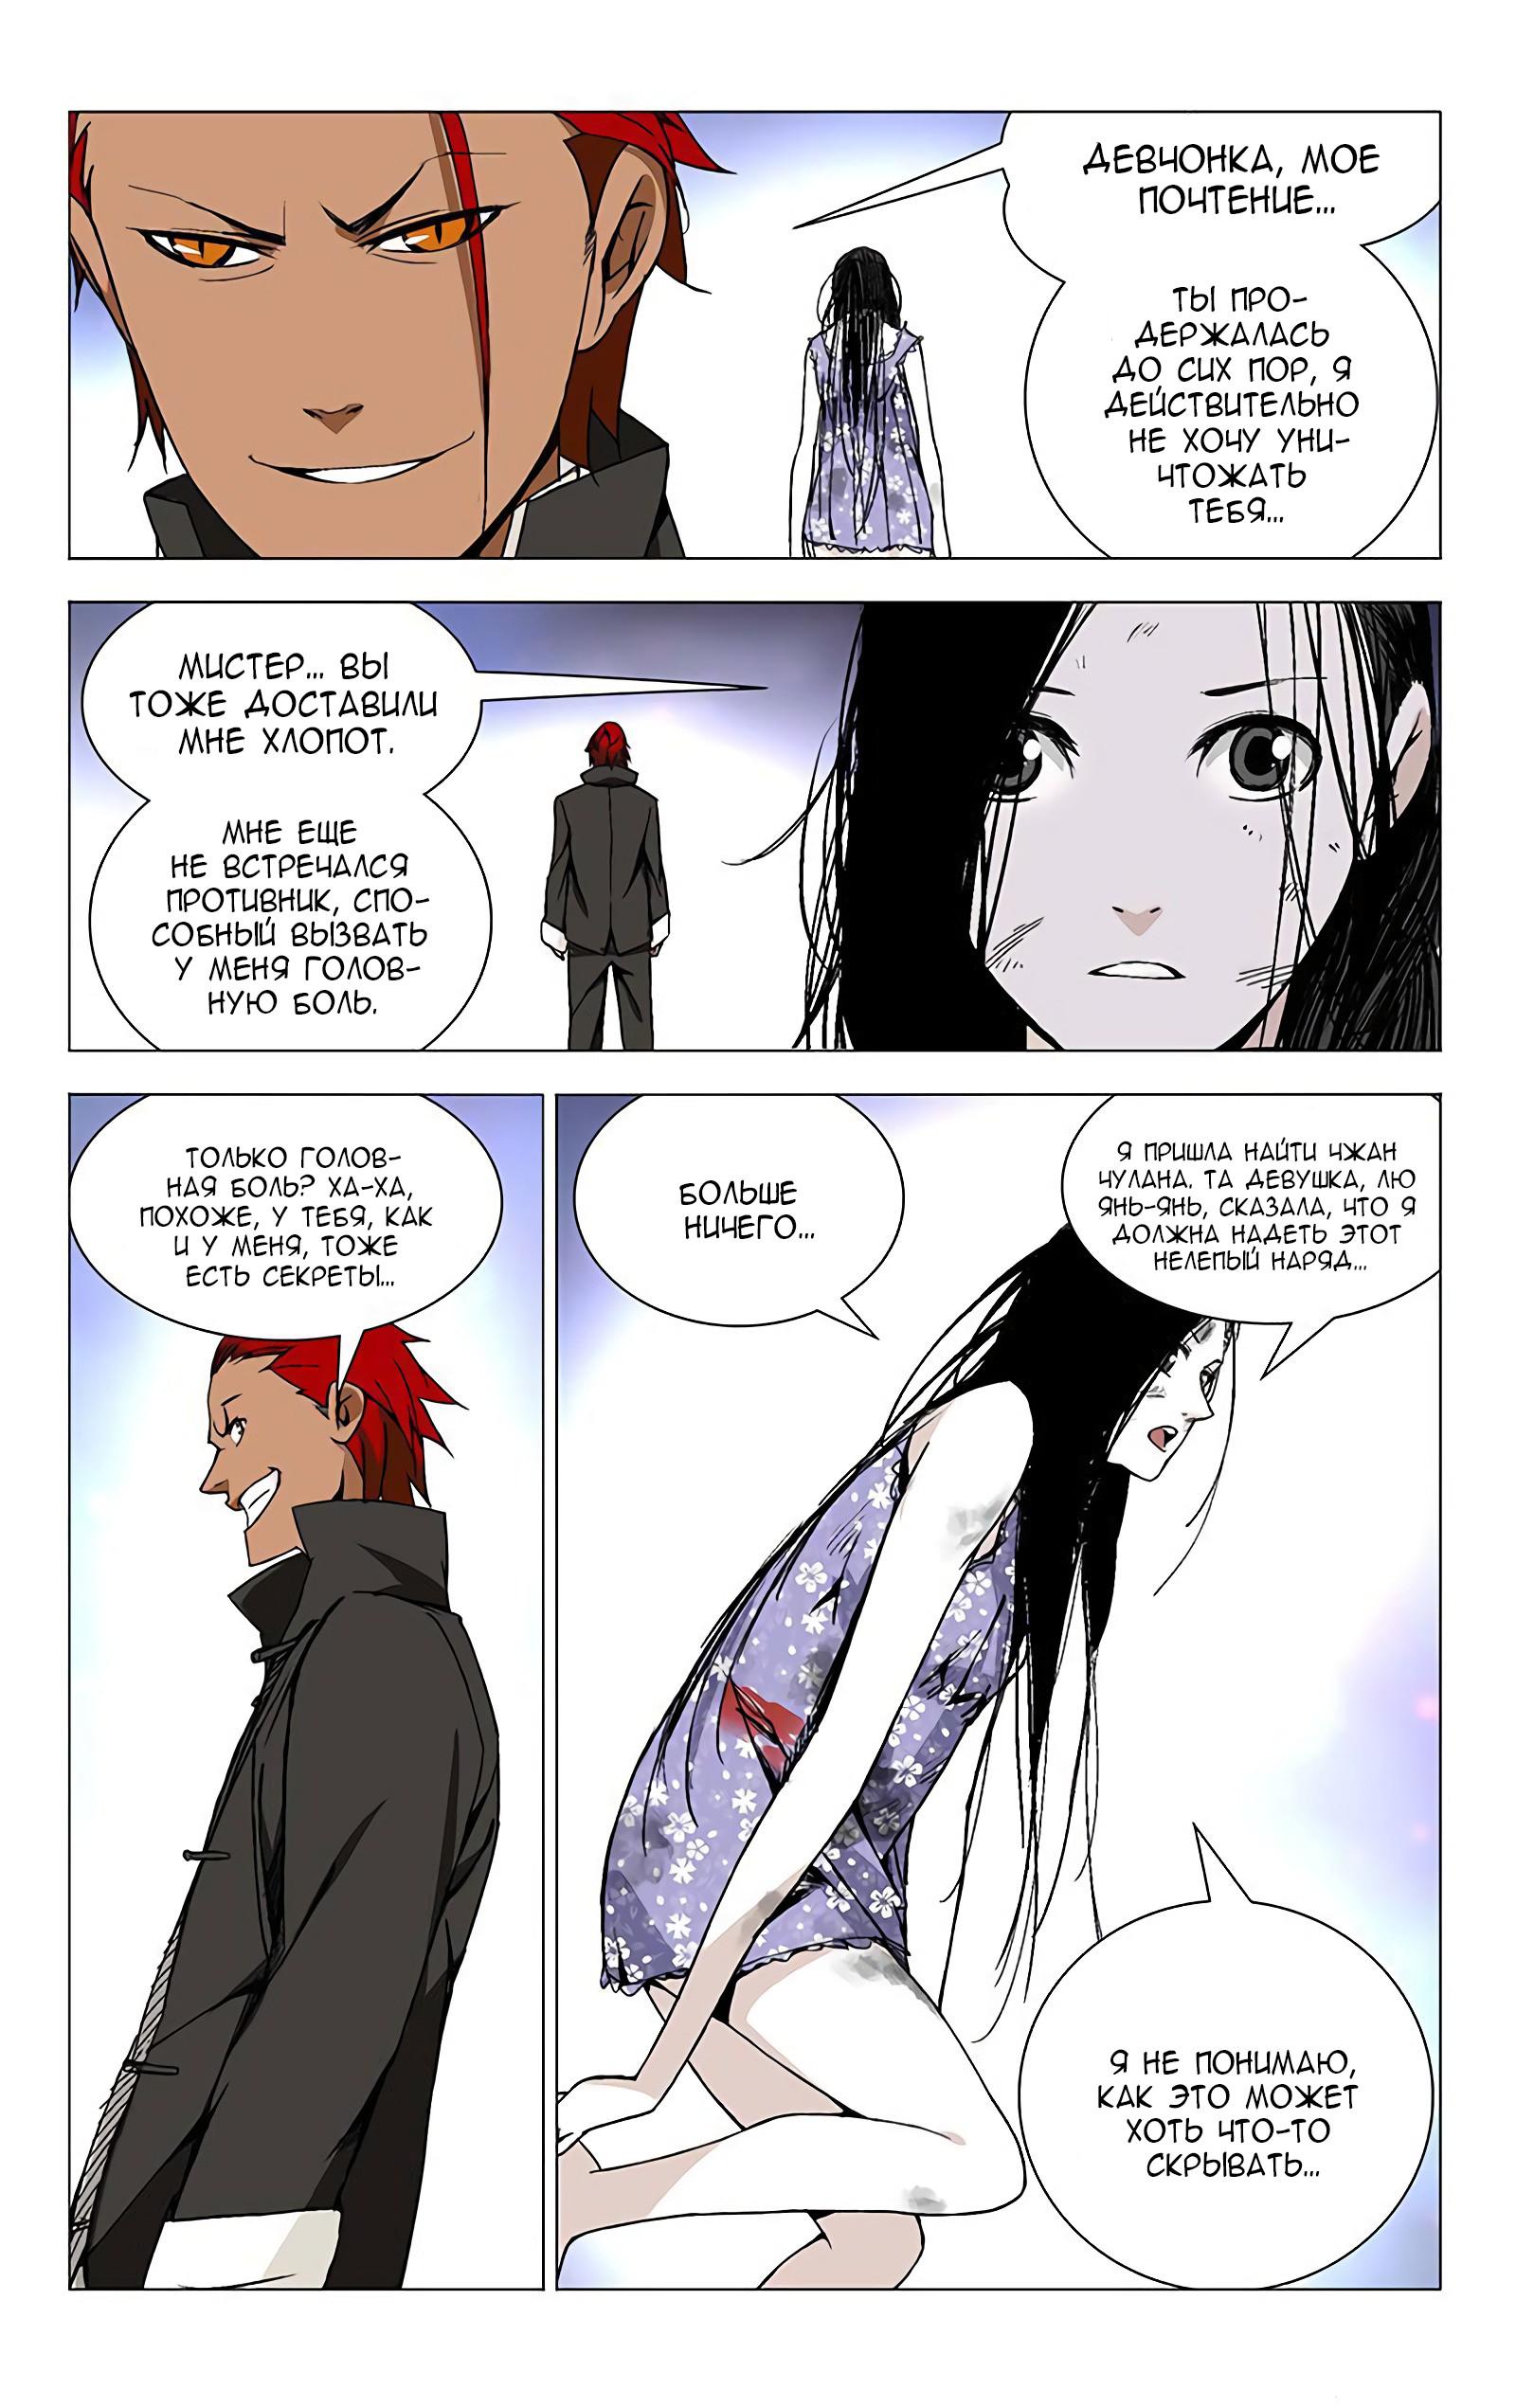 https://r2.ninemanga.com/comics/pic3/39/27047/1278948/1542744541895.jpg Page 3